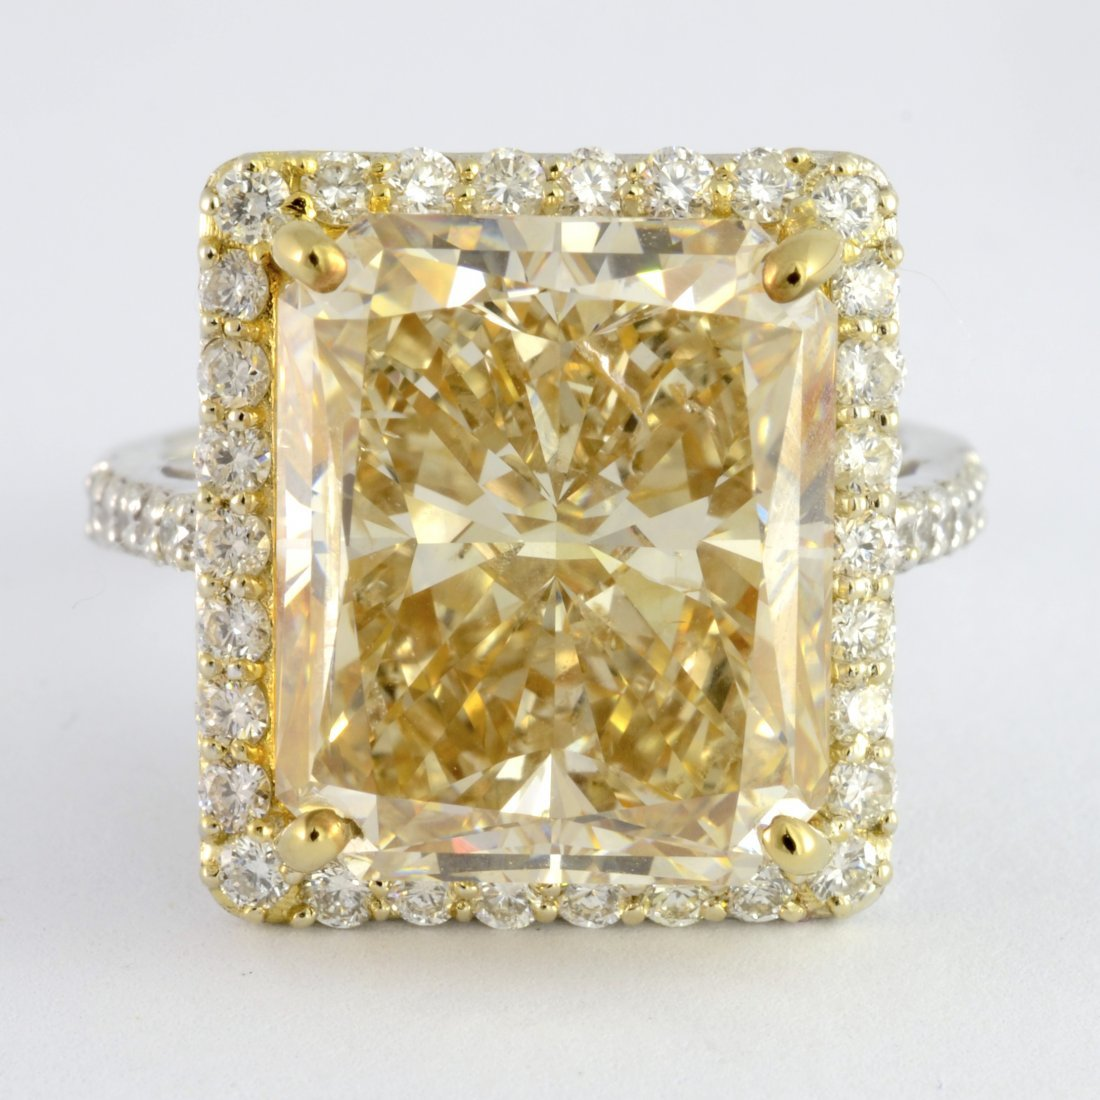 11.00 ct SI2 Clarity Diamond Ring AV: $316,520